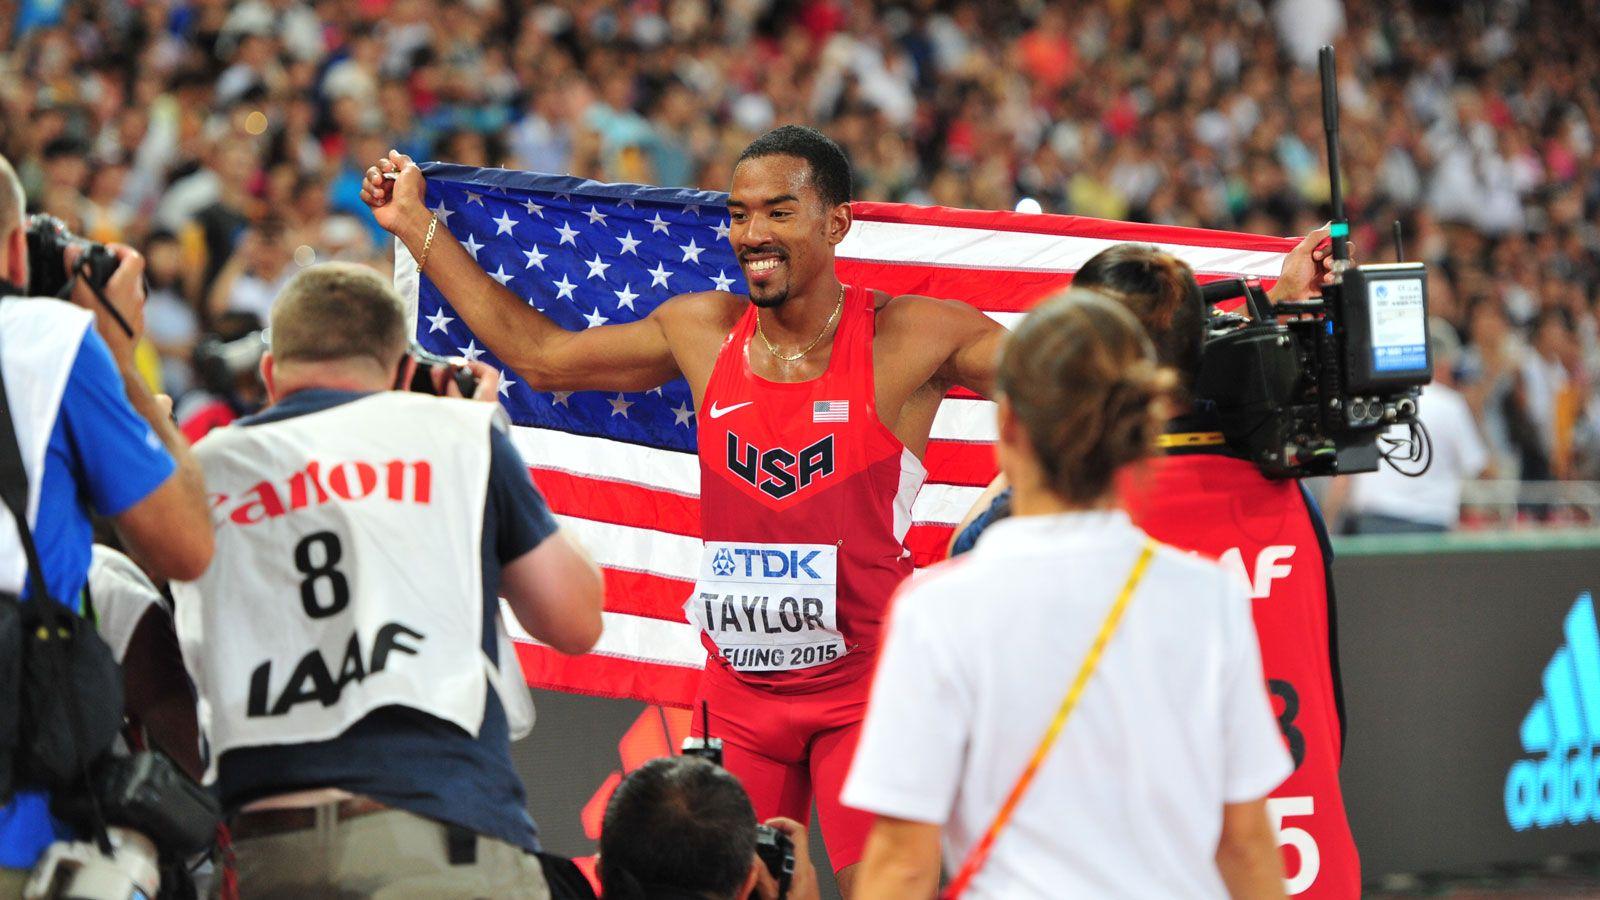 UF's Taylor wins gold at World Championships